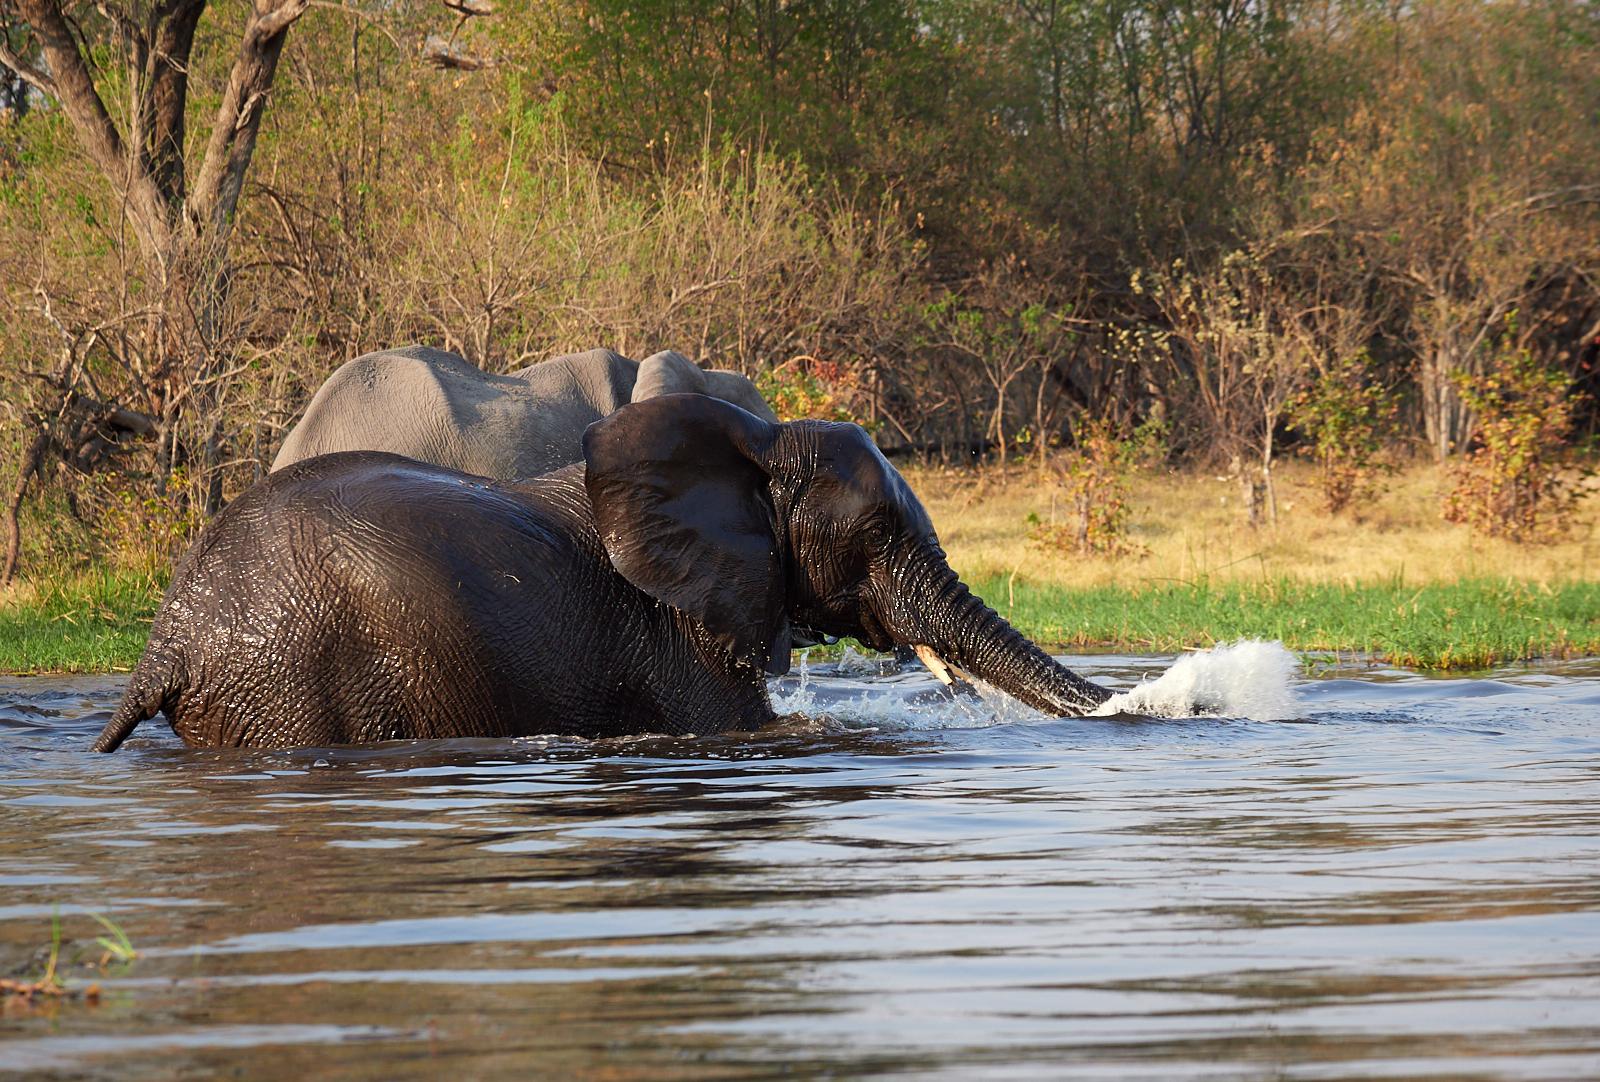 Elephant crossing 1600x1200 sRGB.jpg